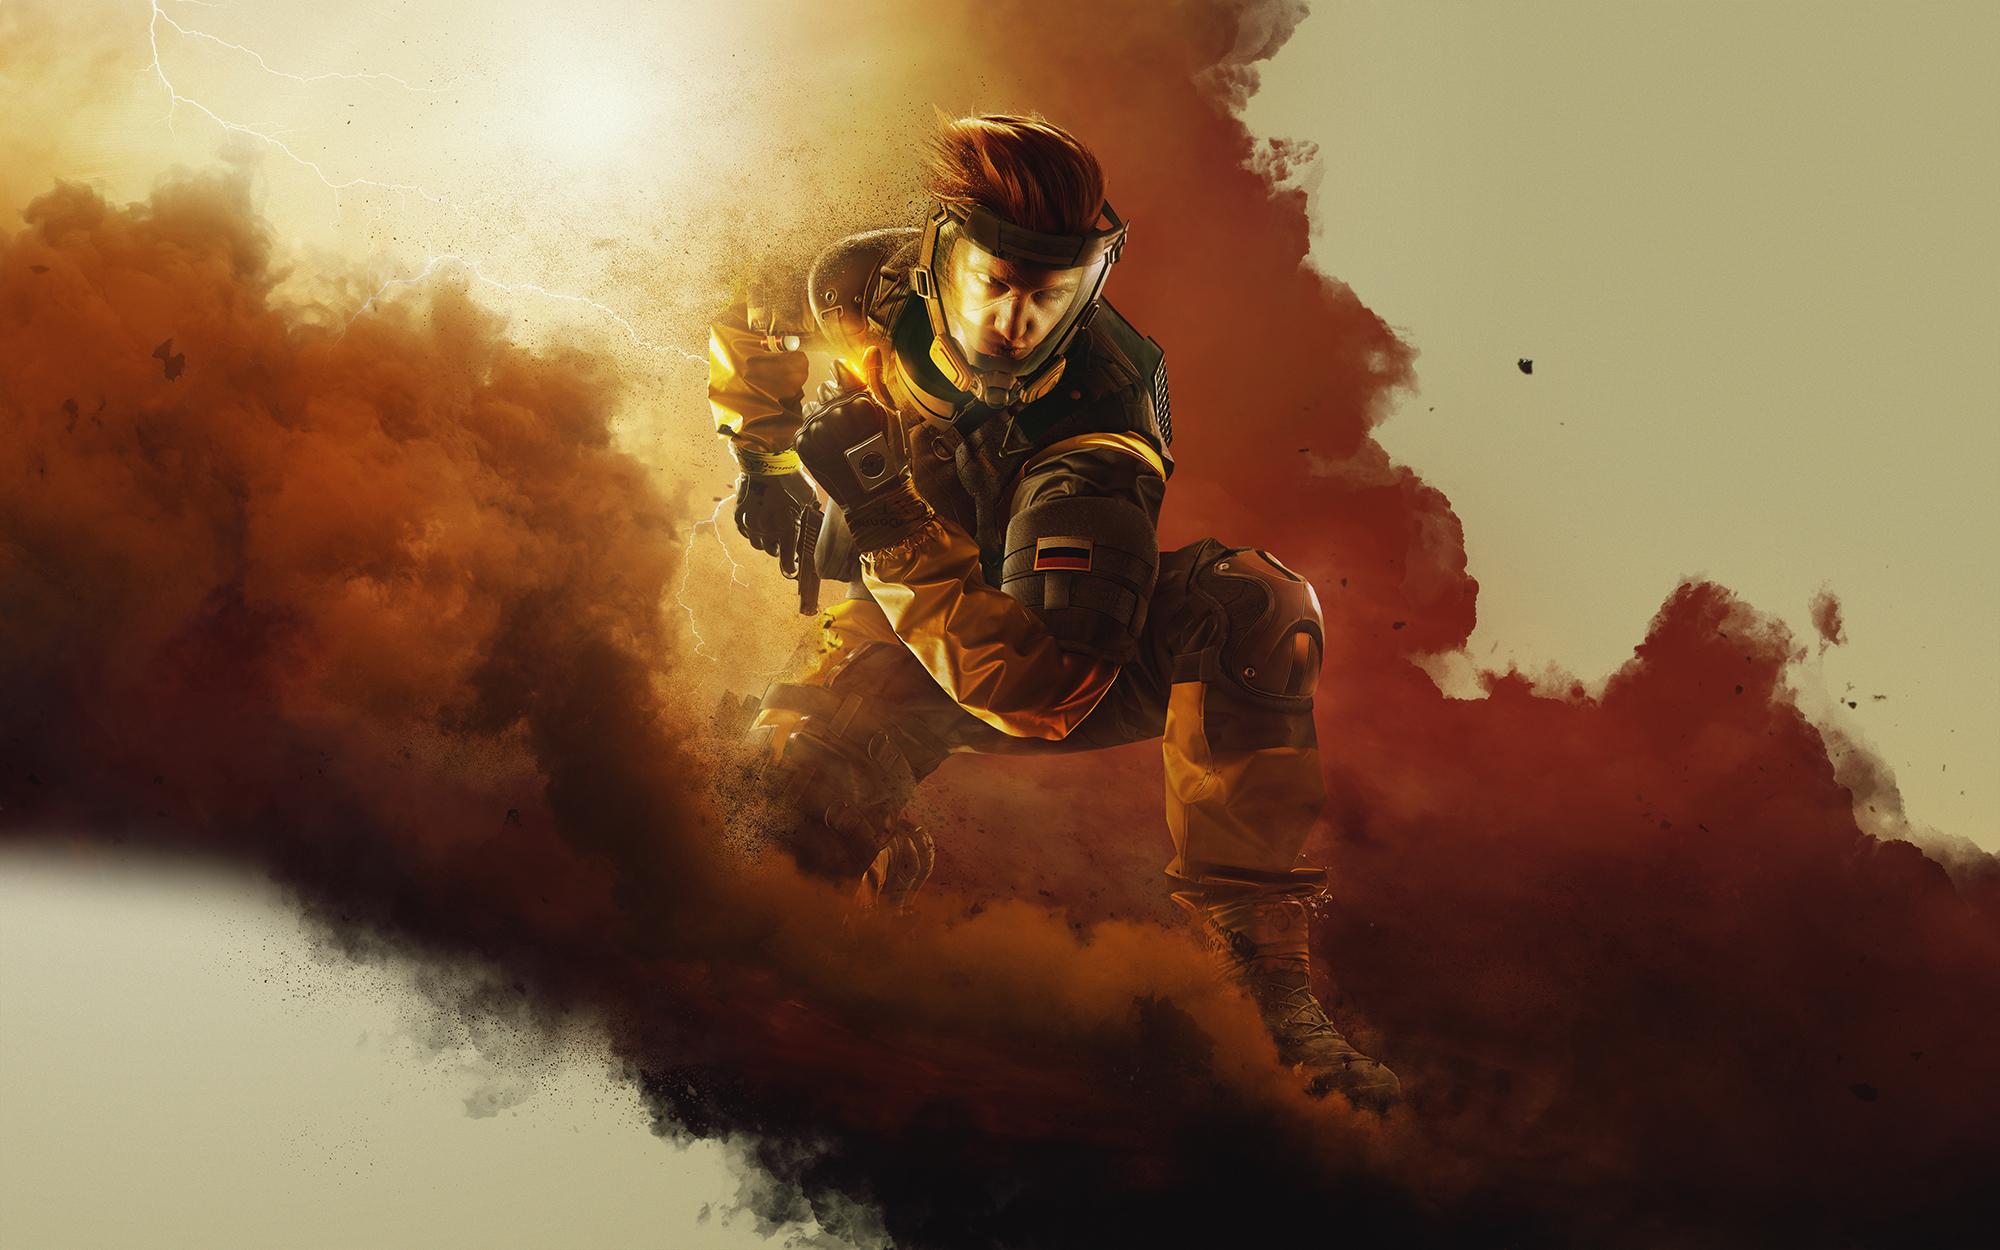 Rainbow Six Siege test server patch buffs Finka, nerfs IQ